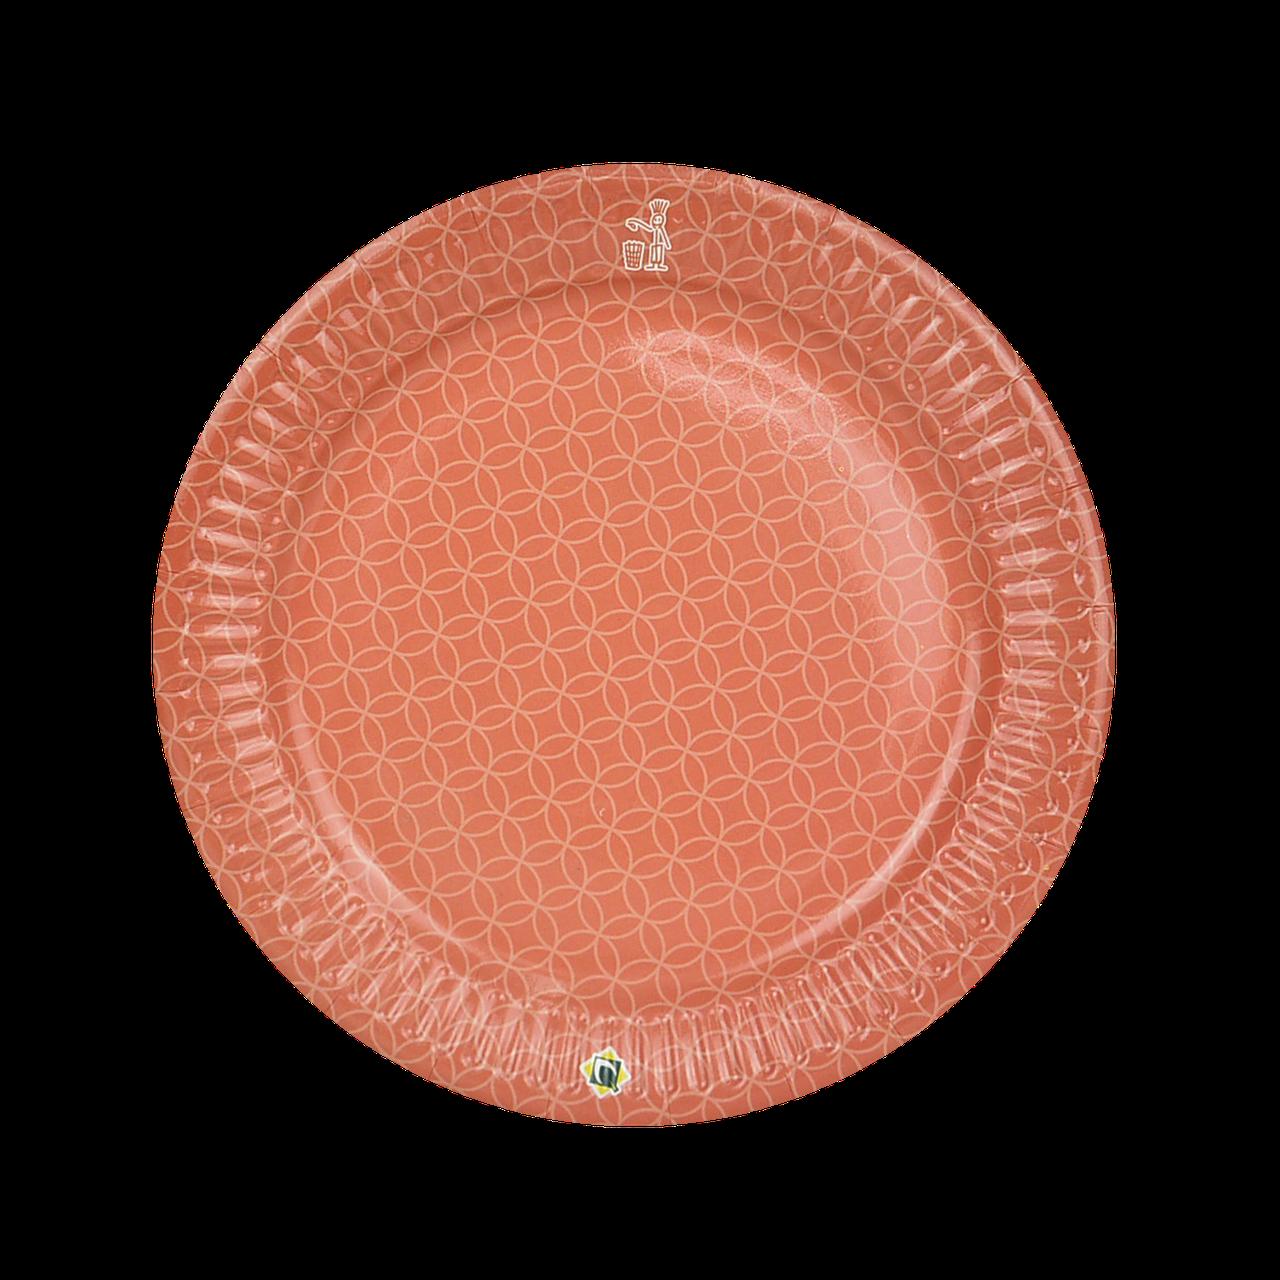 Тарелка картонная Оранжевая  ХТ18 25шт/уп (1ящ/48уп/1200шт)